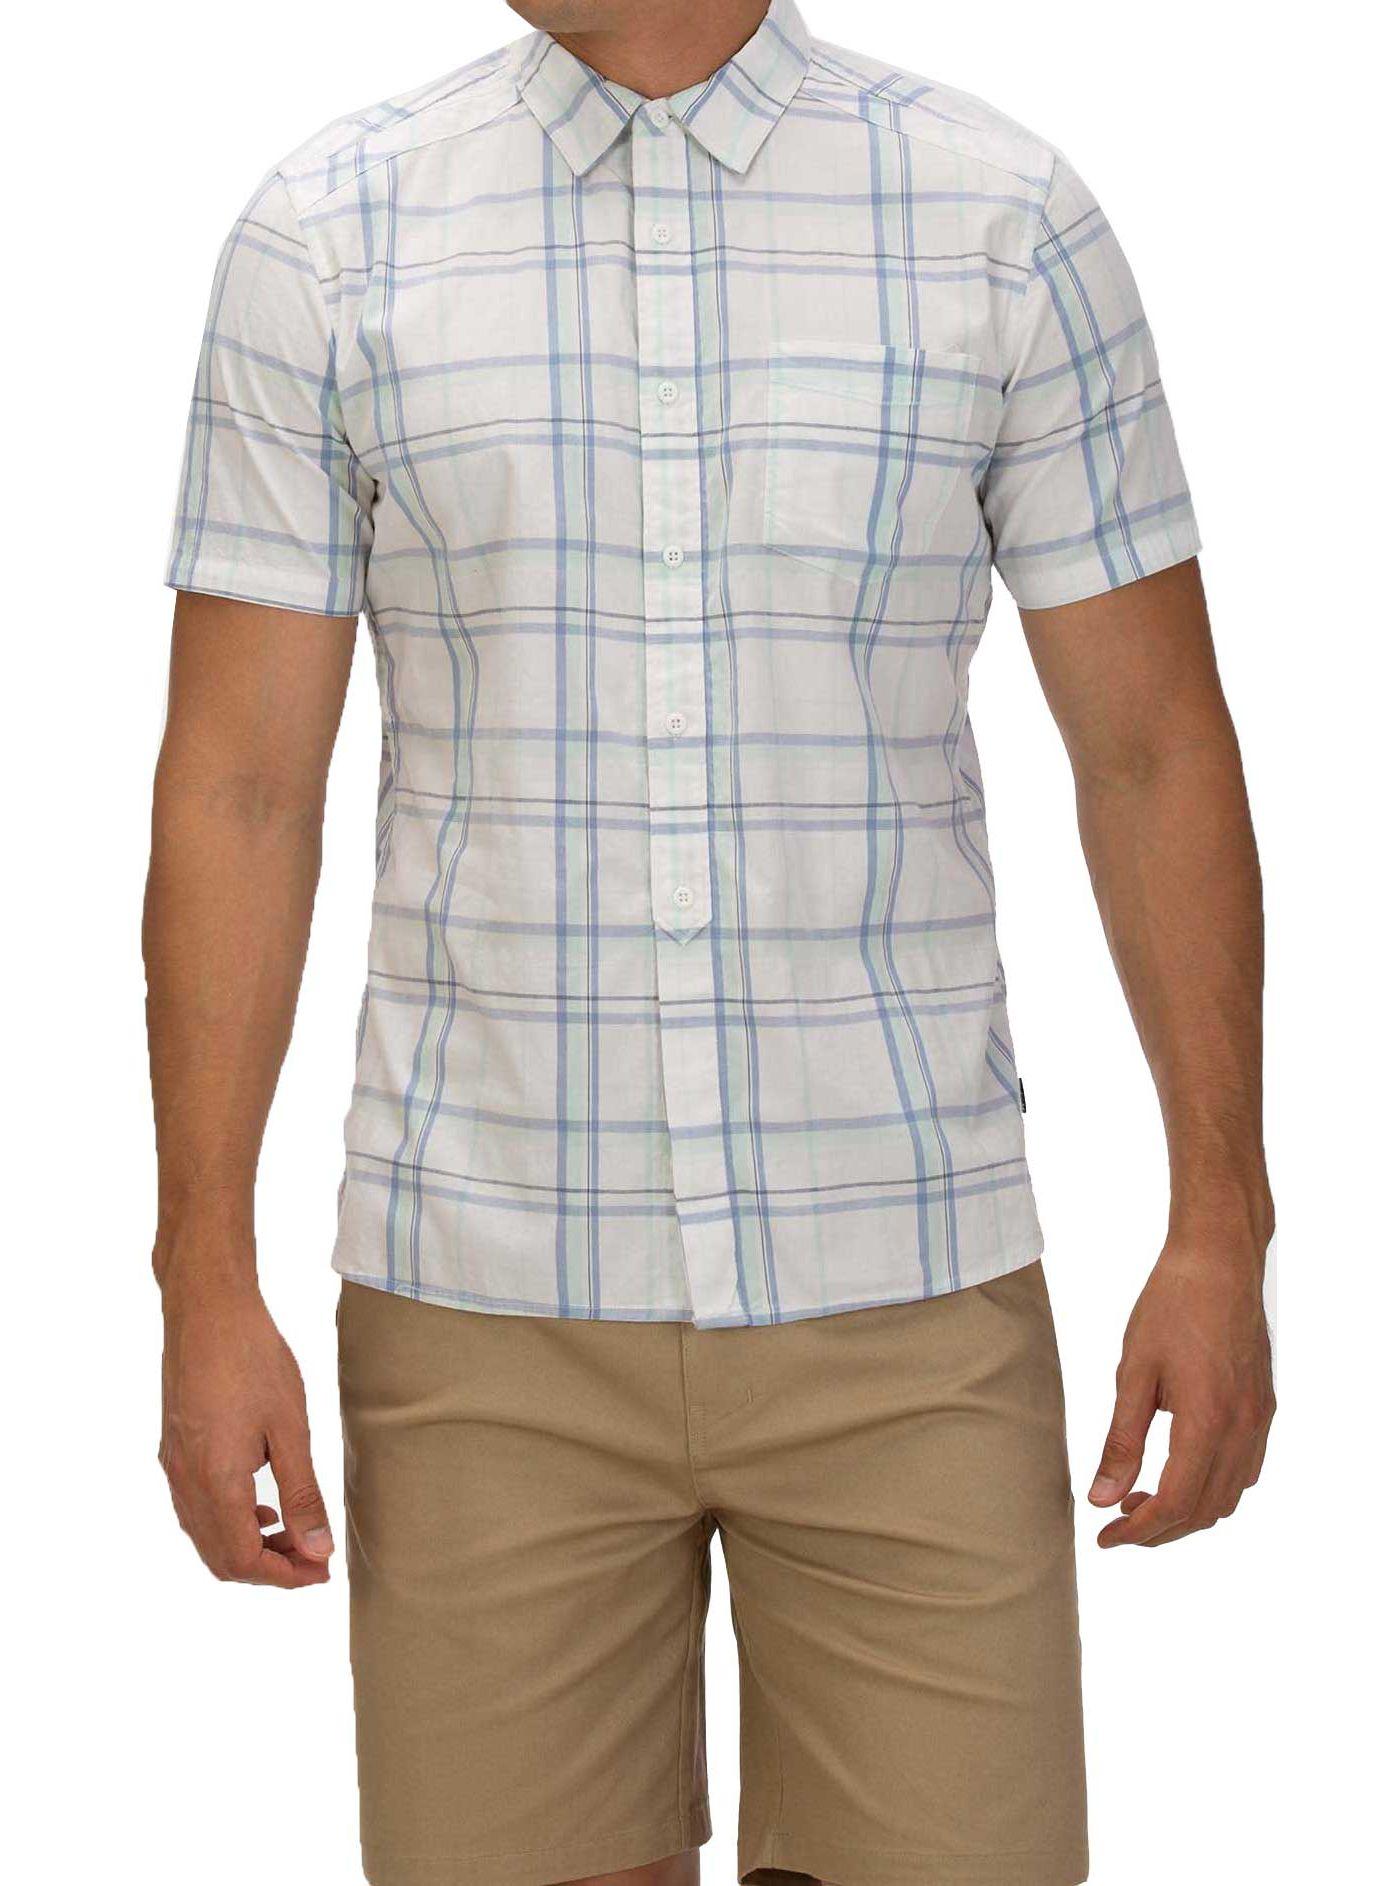 Hurley Men's Frankie Stretch Short Sleeve Button Down Shirt